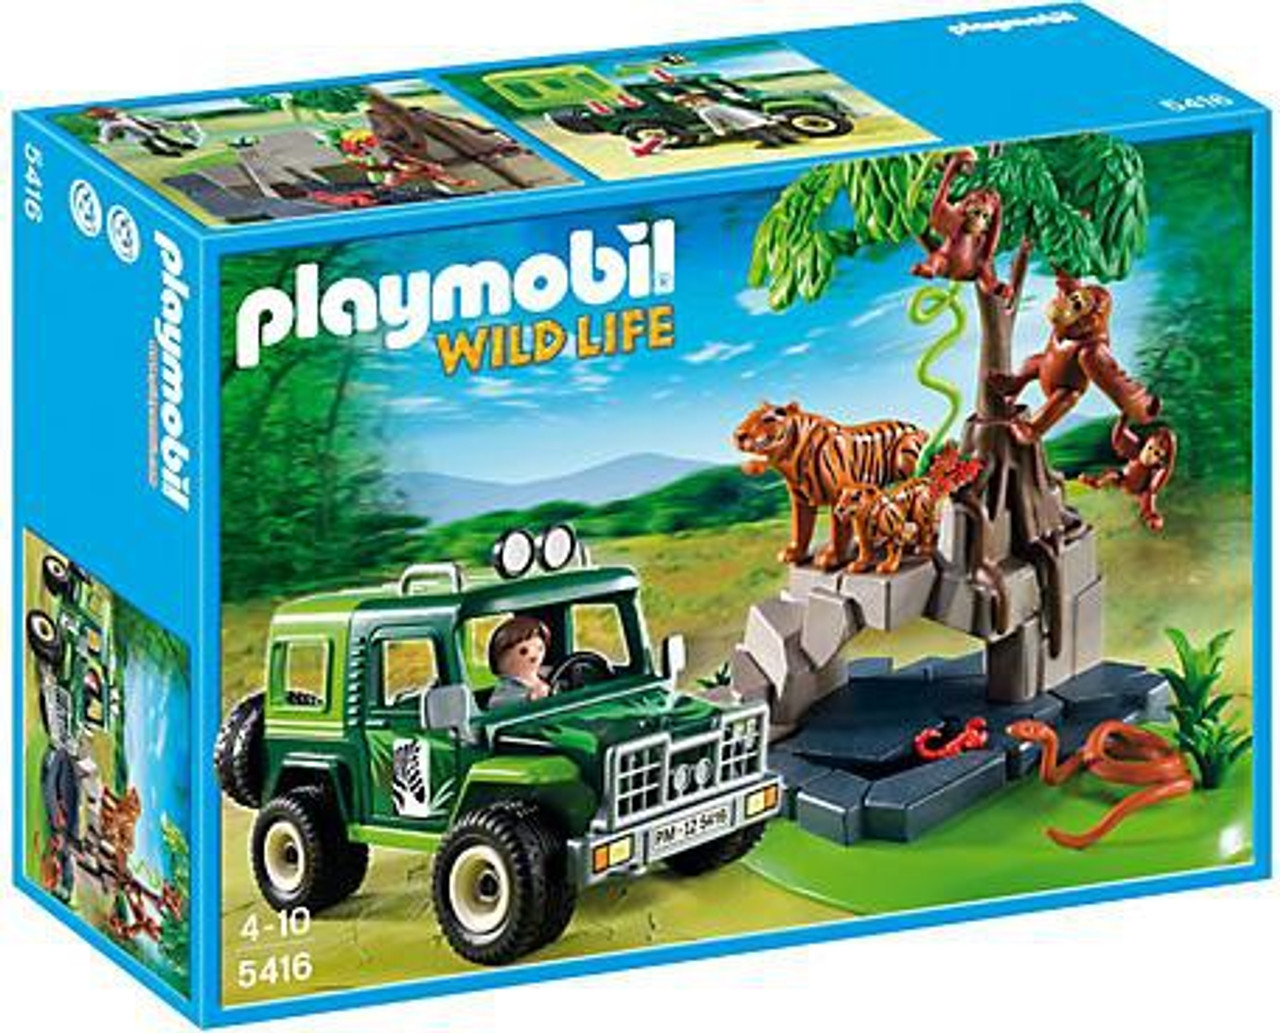 Playmobil New Style Lynx Wildlife for zoo safari NEW